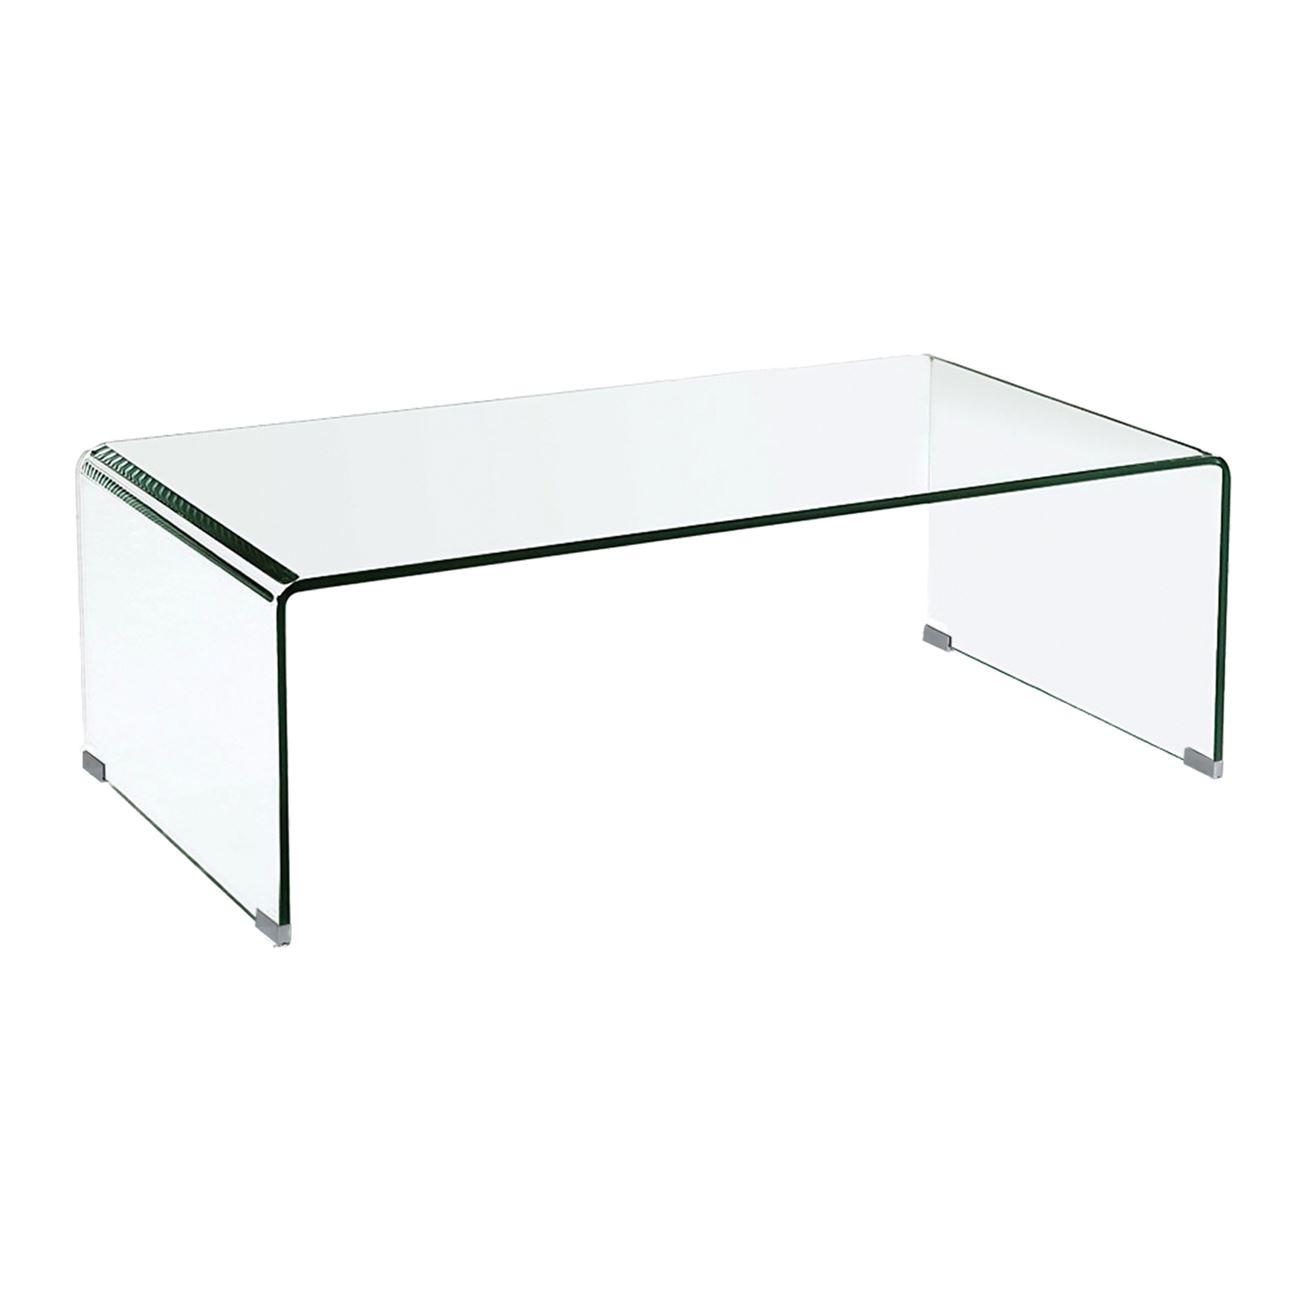 GLASSER Clear Κονσόλα γυαλί 12mm 110x35x75cm